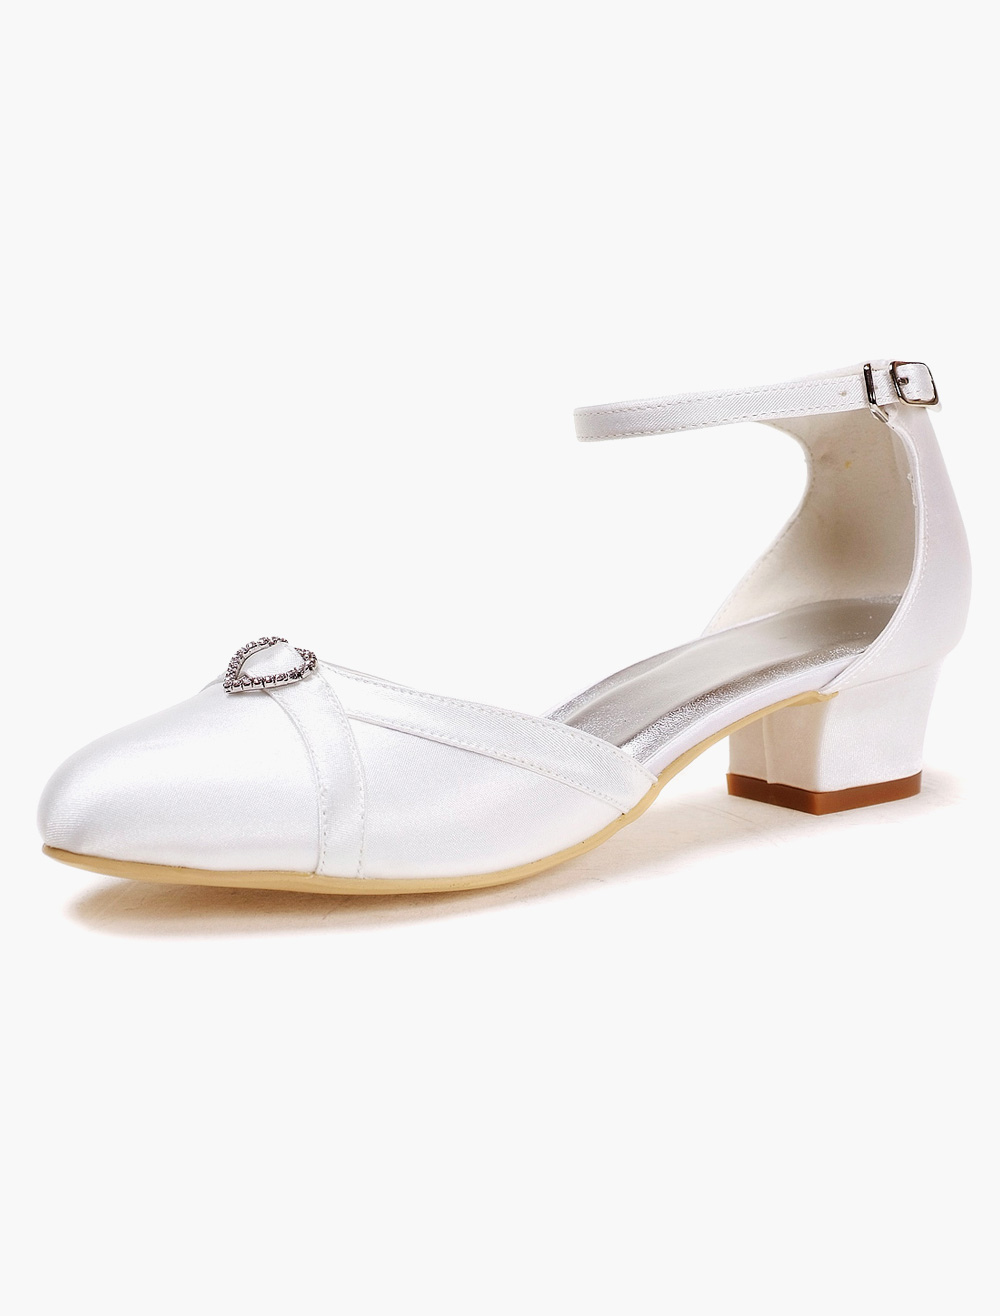 White Silk And Satin Rhinestones Pumps For Bride